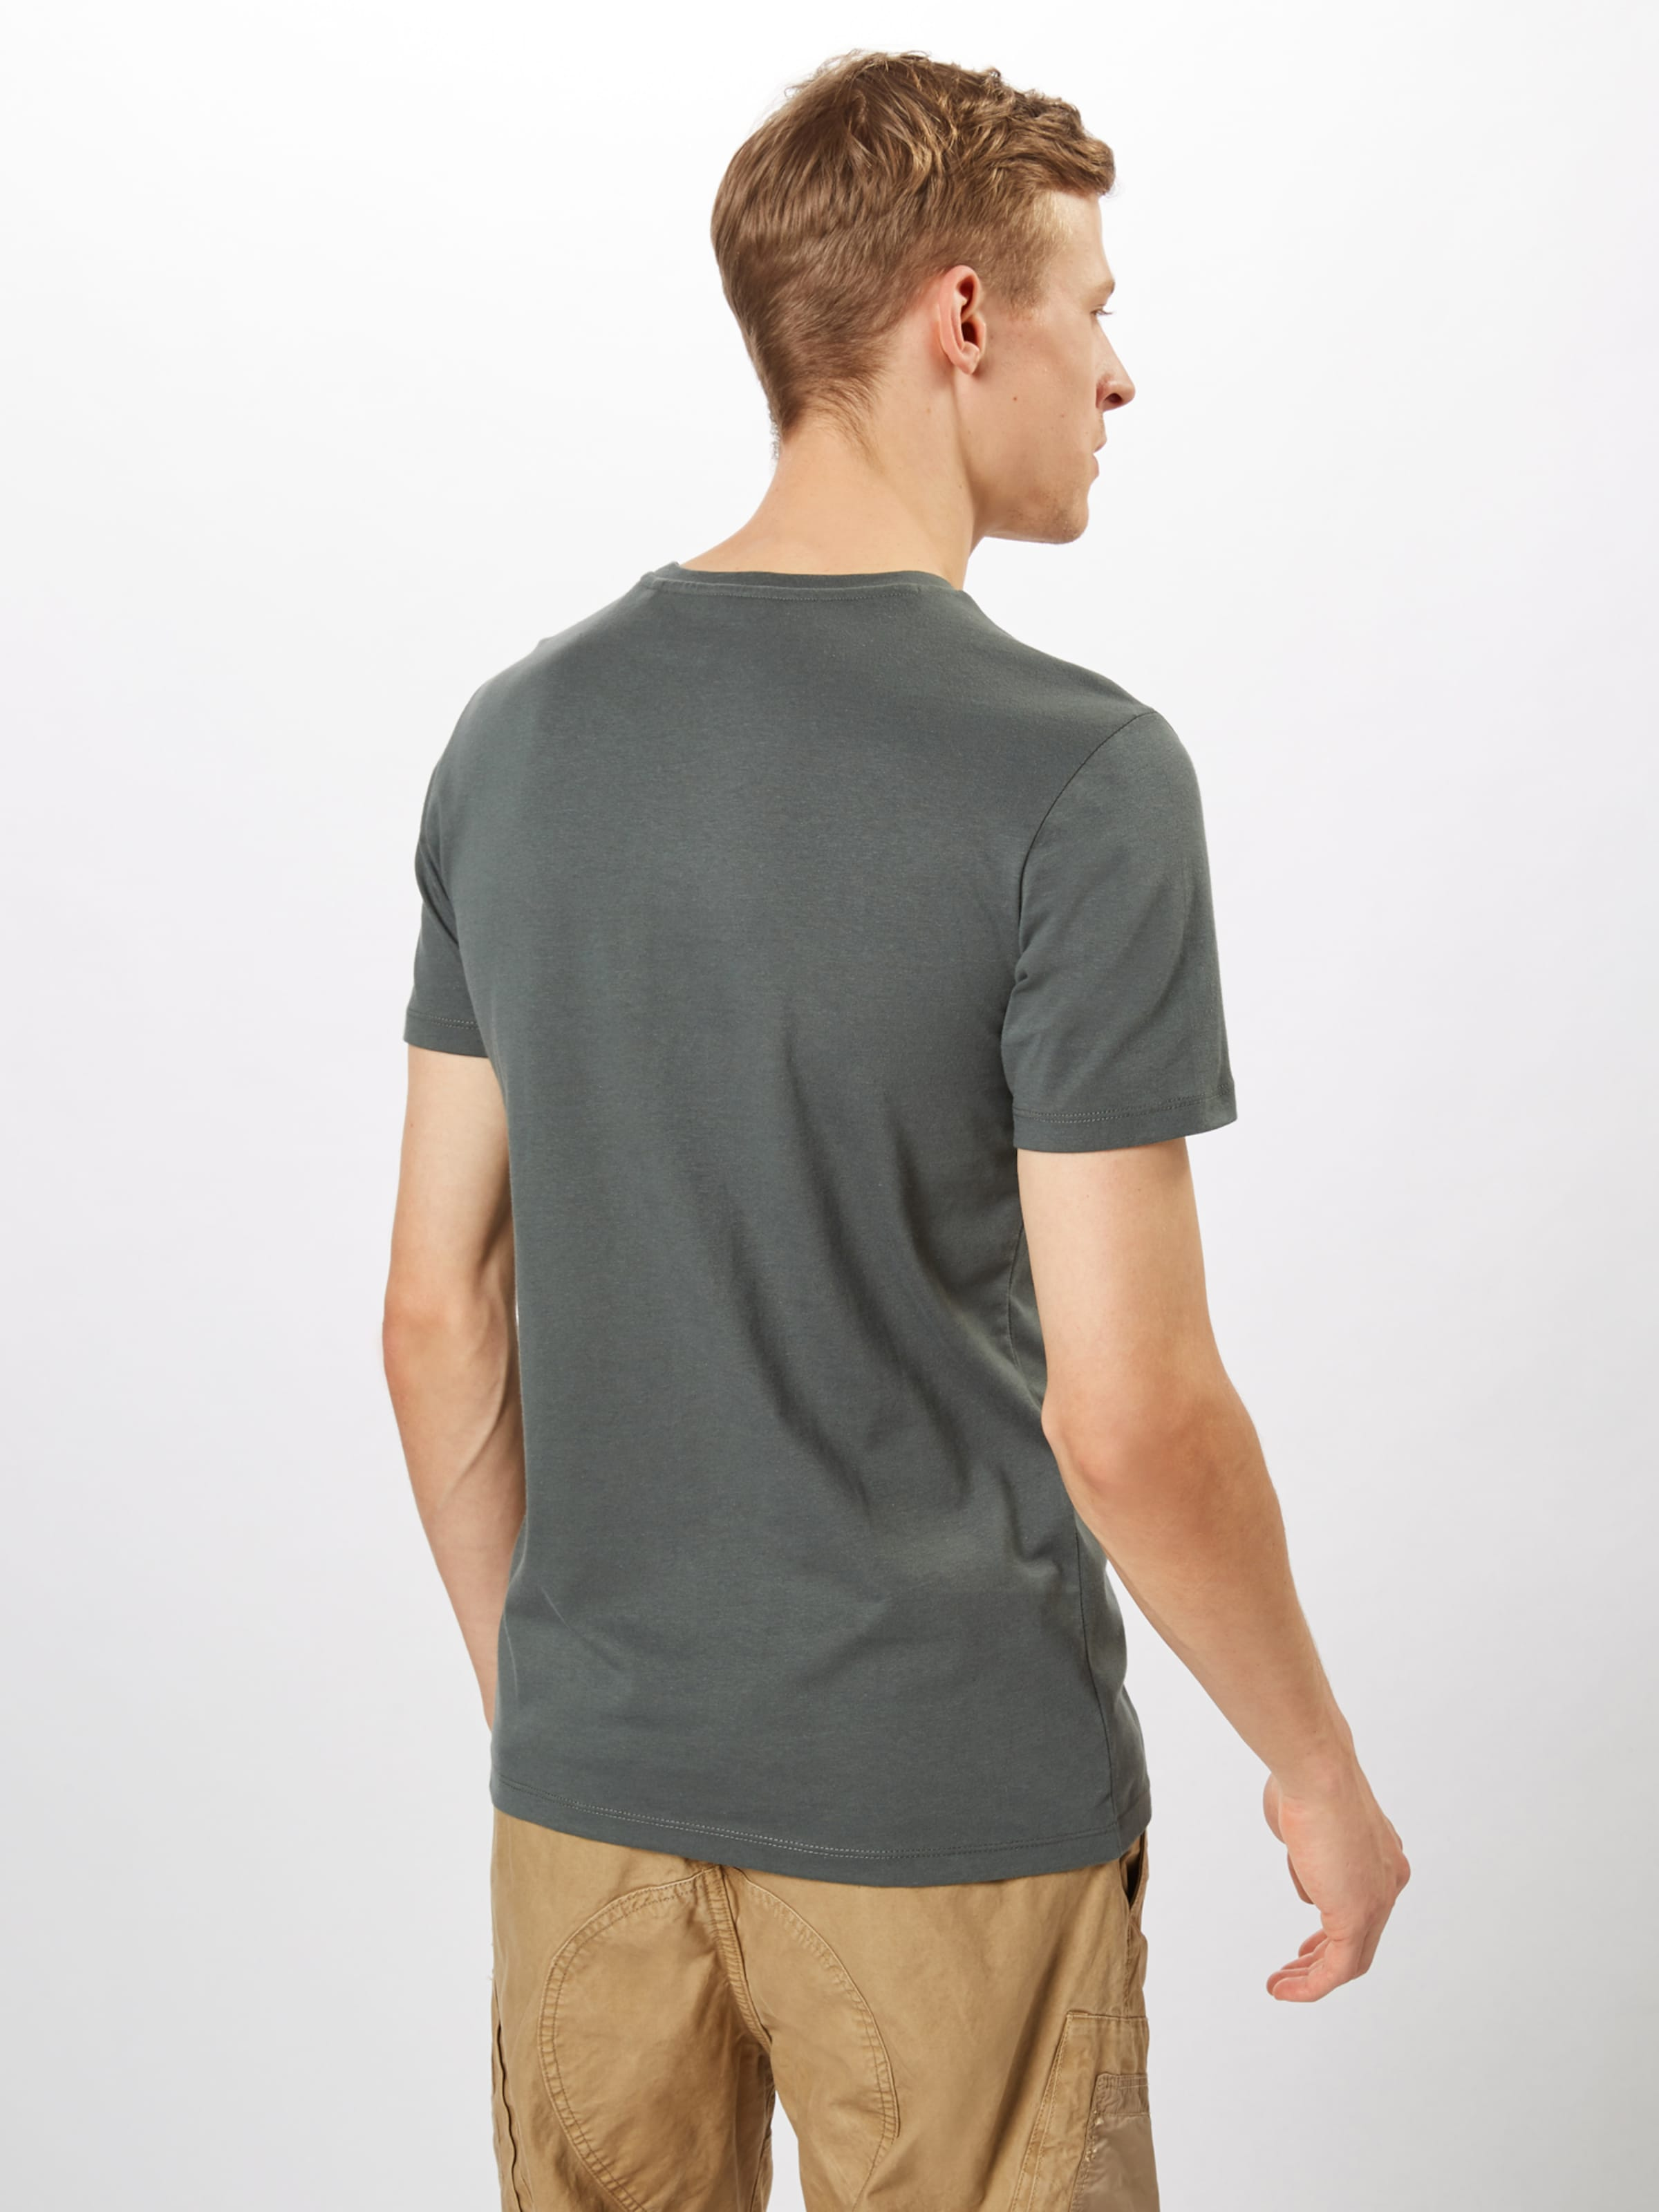 T O'polo En Gris Foncé Marc shirt rdeCxoWB